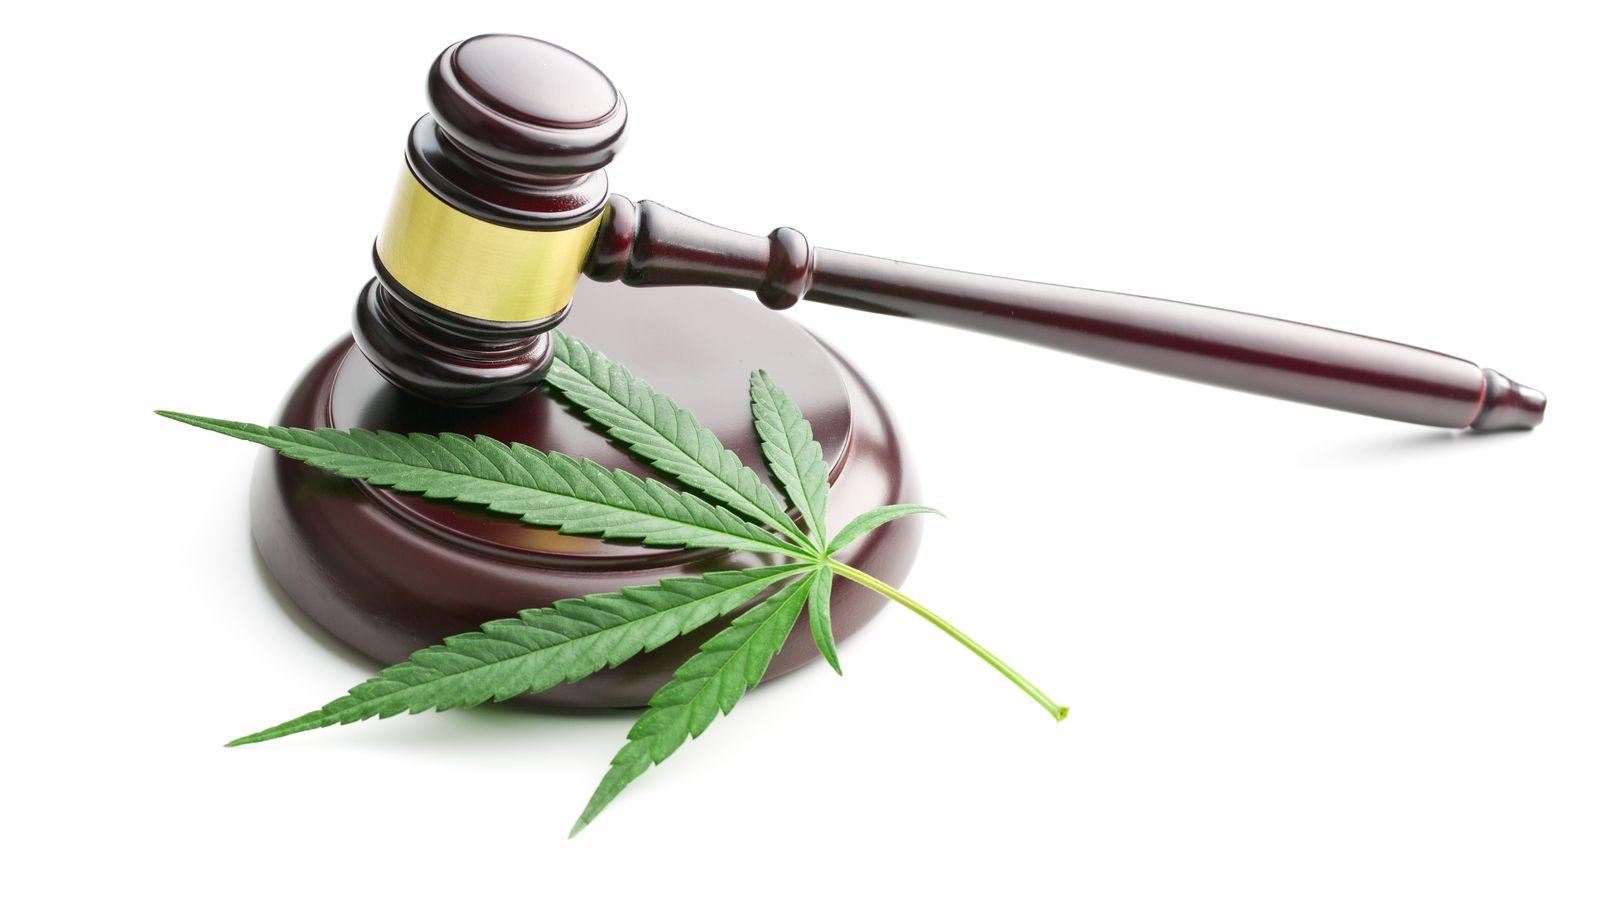 4 Top Marijuana Penny Stocks to Take Seriously in 2019